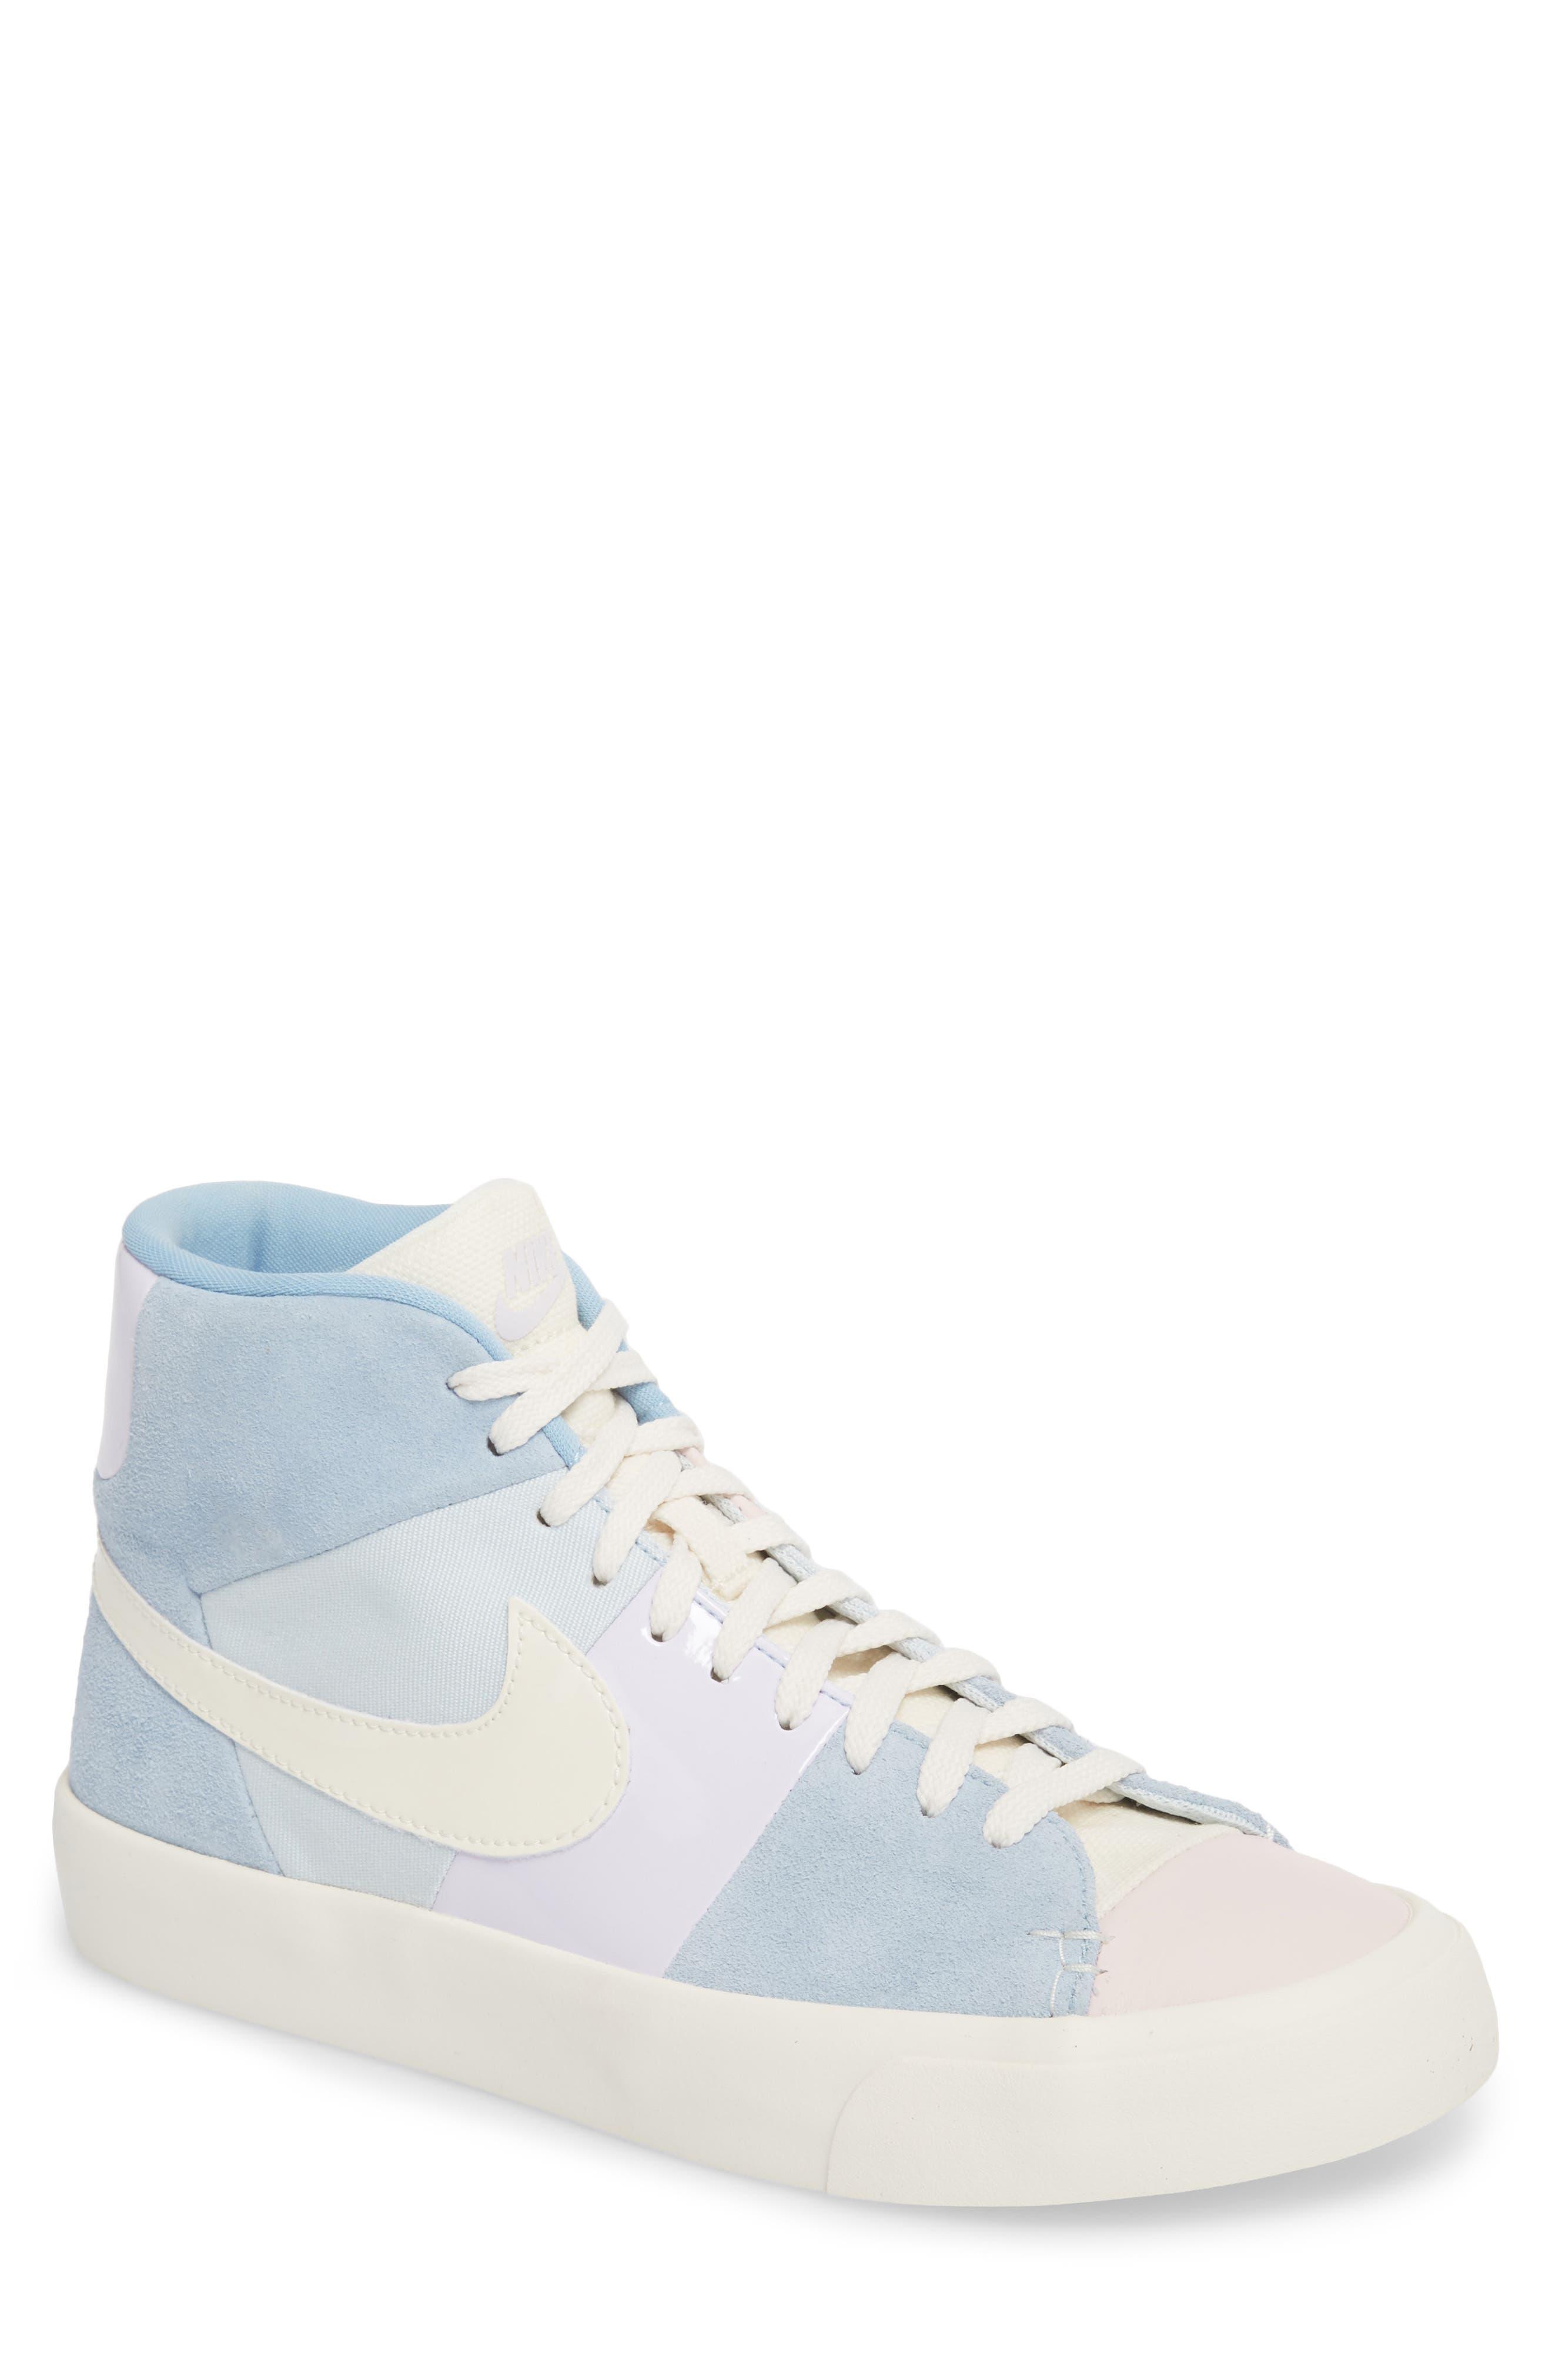 Blazer Royal Easter QS High Top Sneaker,                         Main,                         color, Arctic Pink/ Sail-Blue-Blue